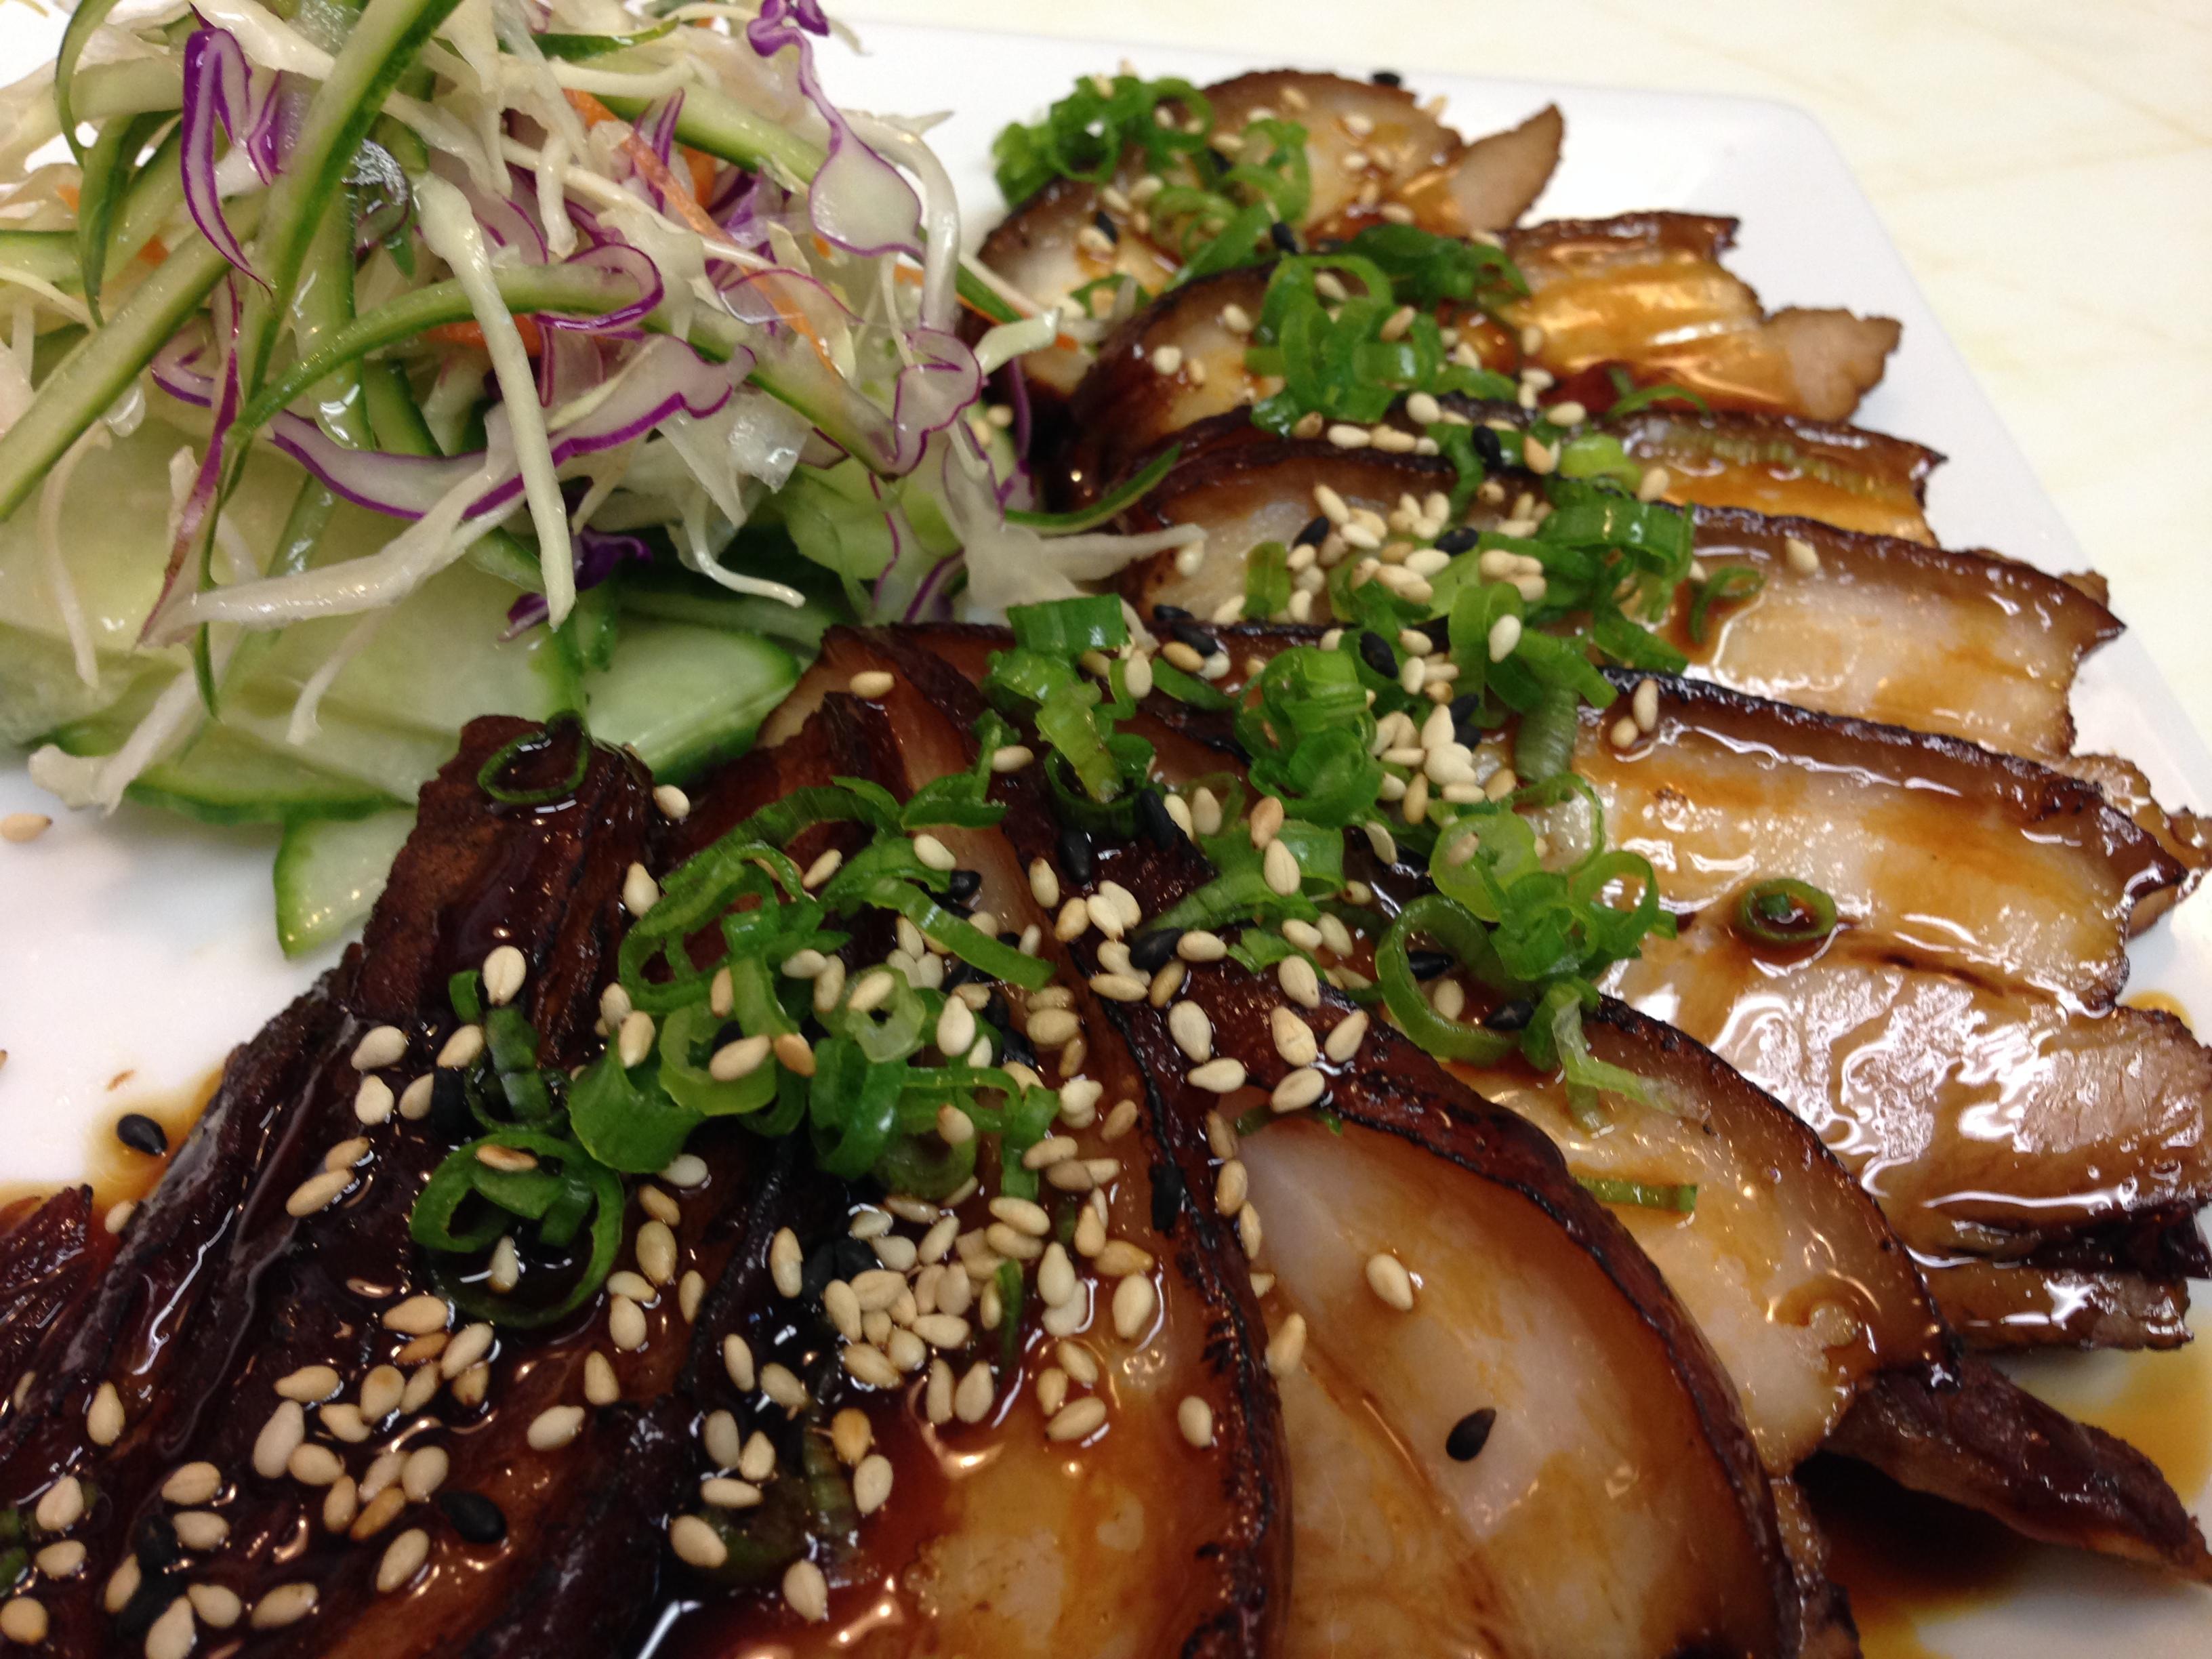 Chashu Appetizer (Pork Belly)